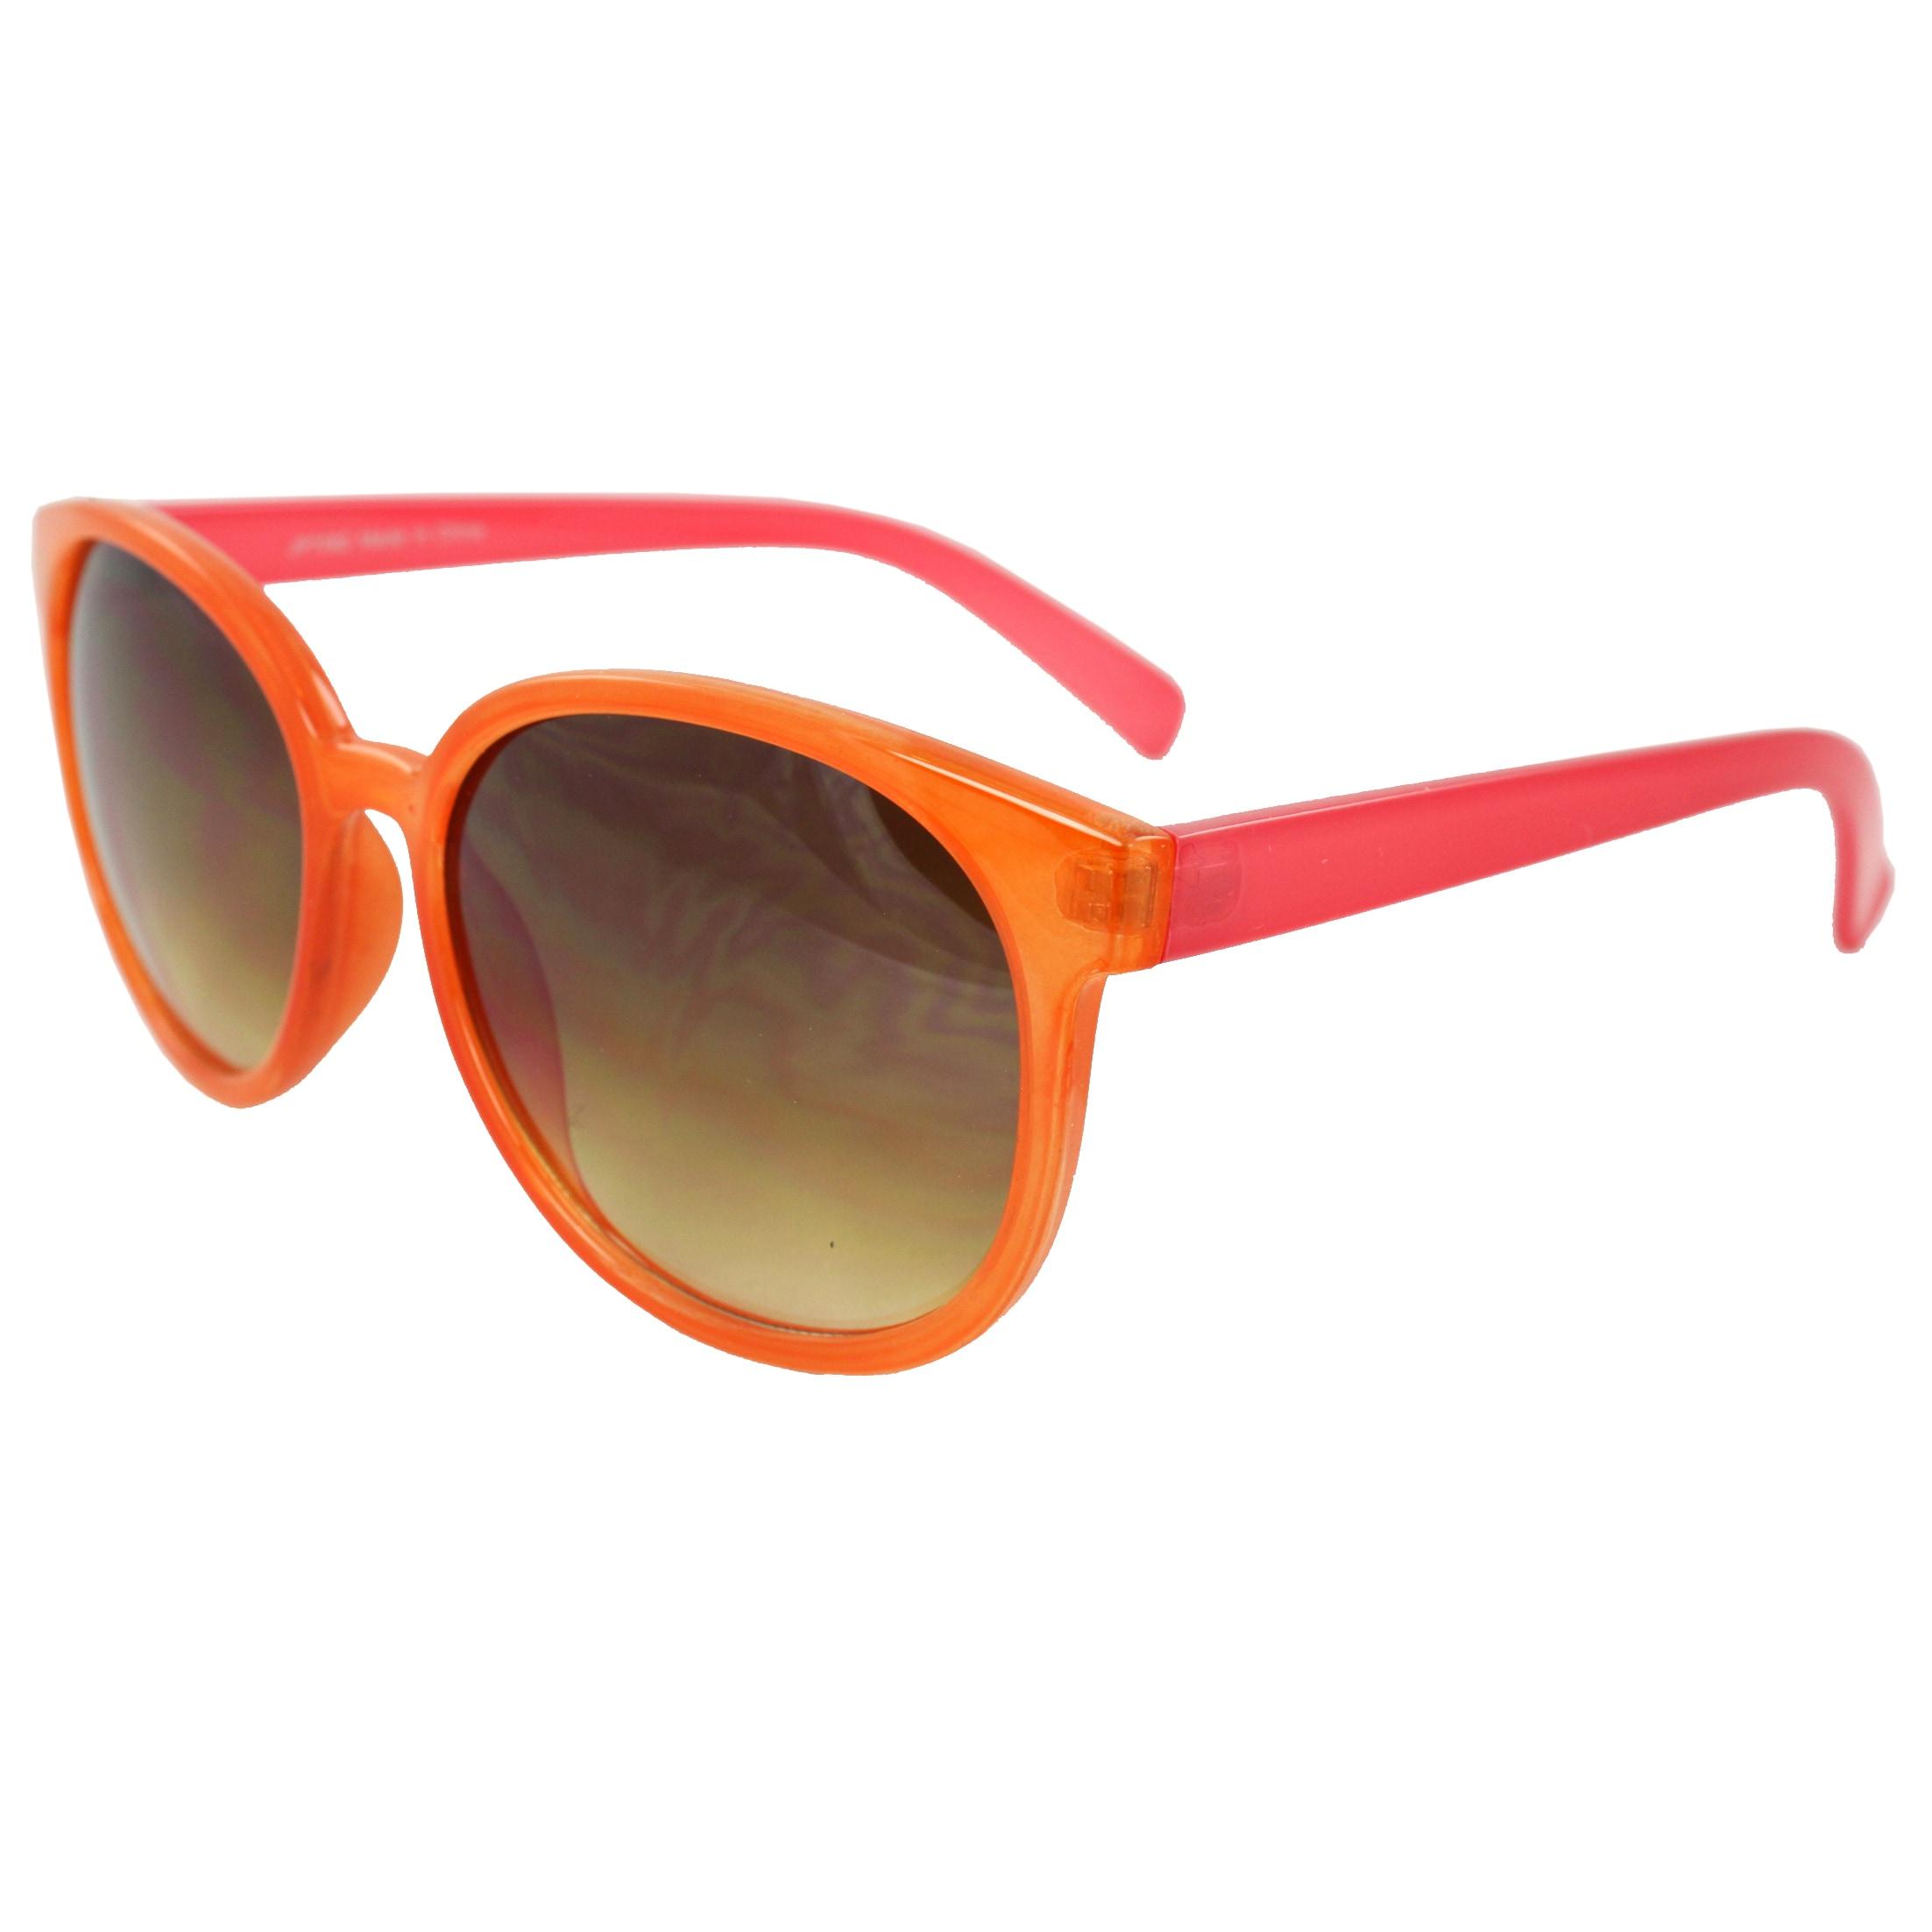 Women's Orange/ Pink Oval Fashion Sunglasses